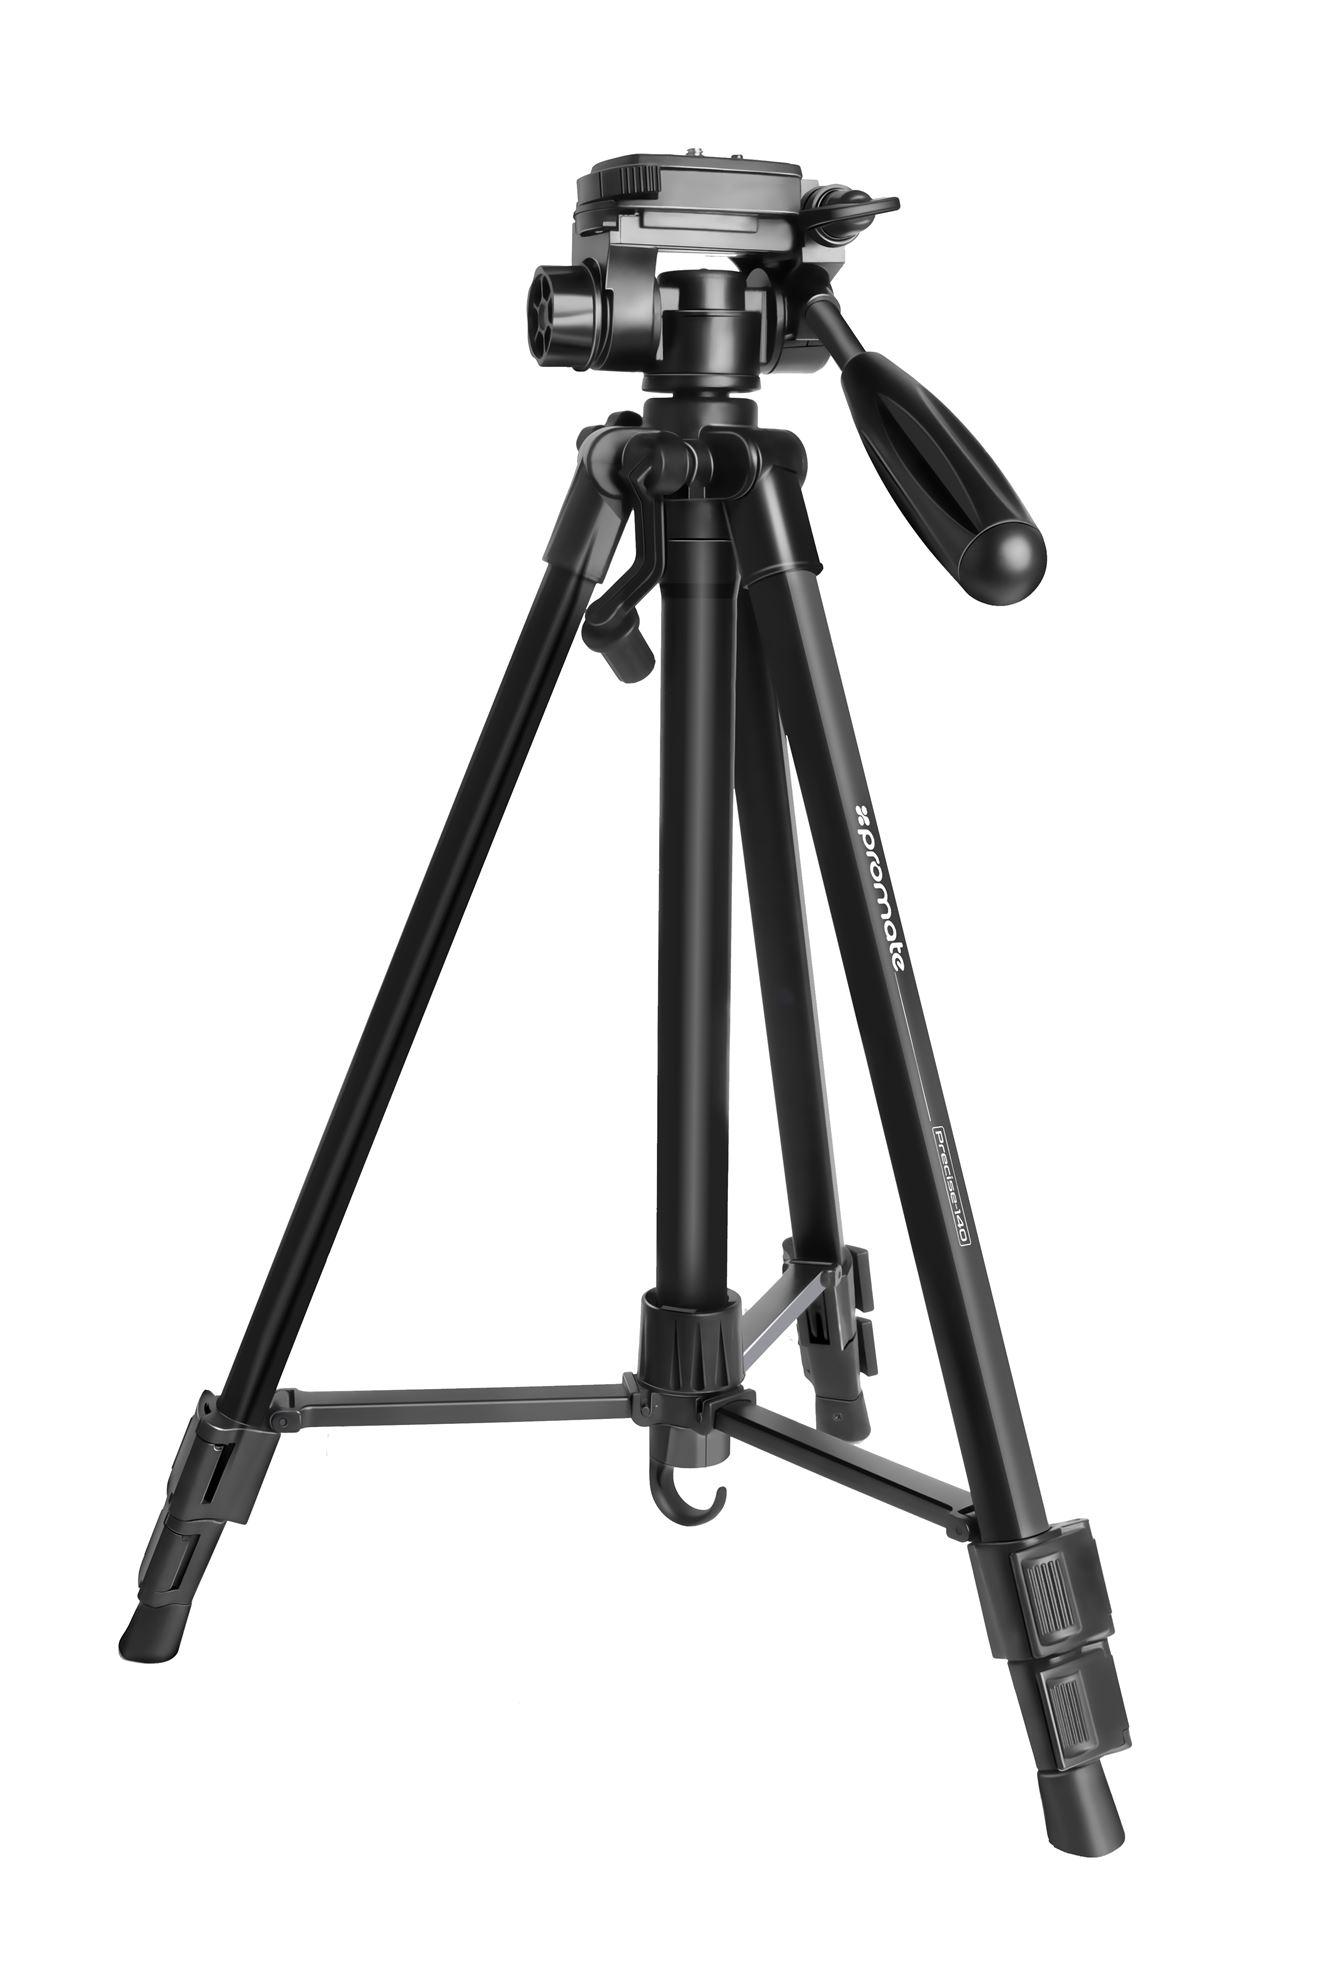 Promate 3 Way Precision Head Tripod 50cm 150cm Height